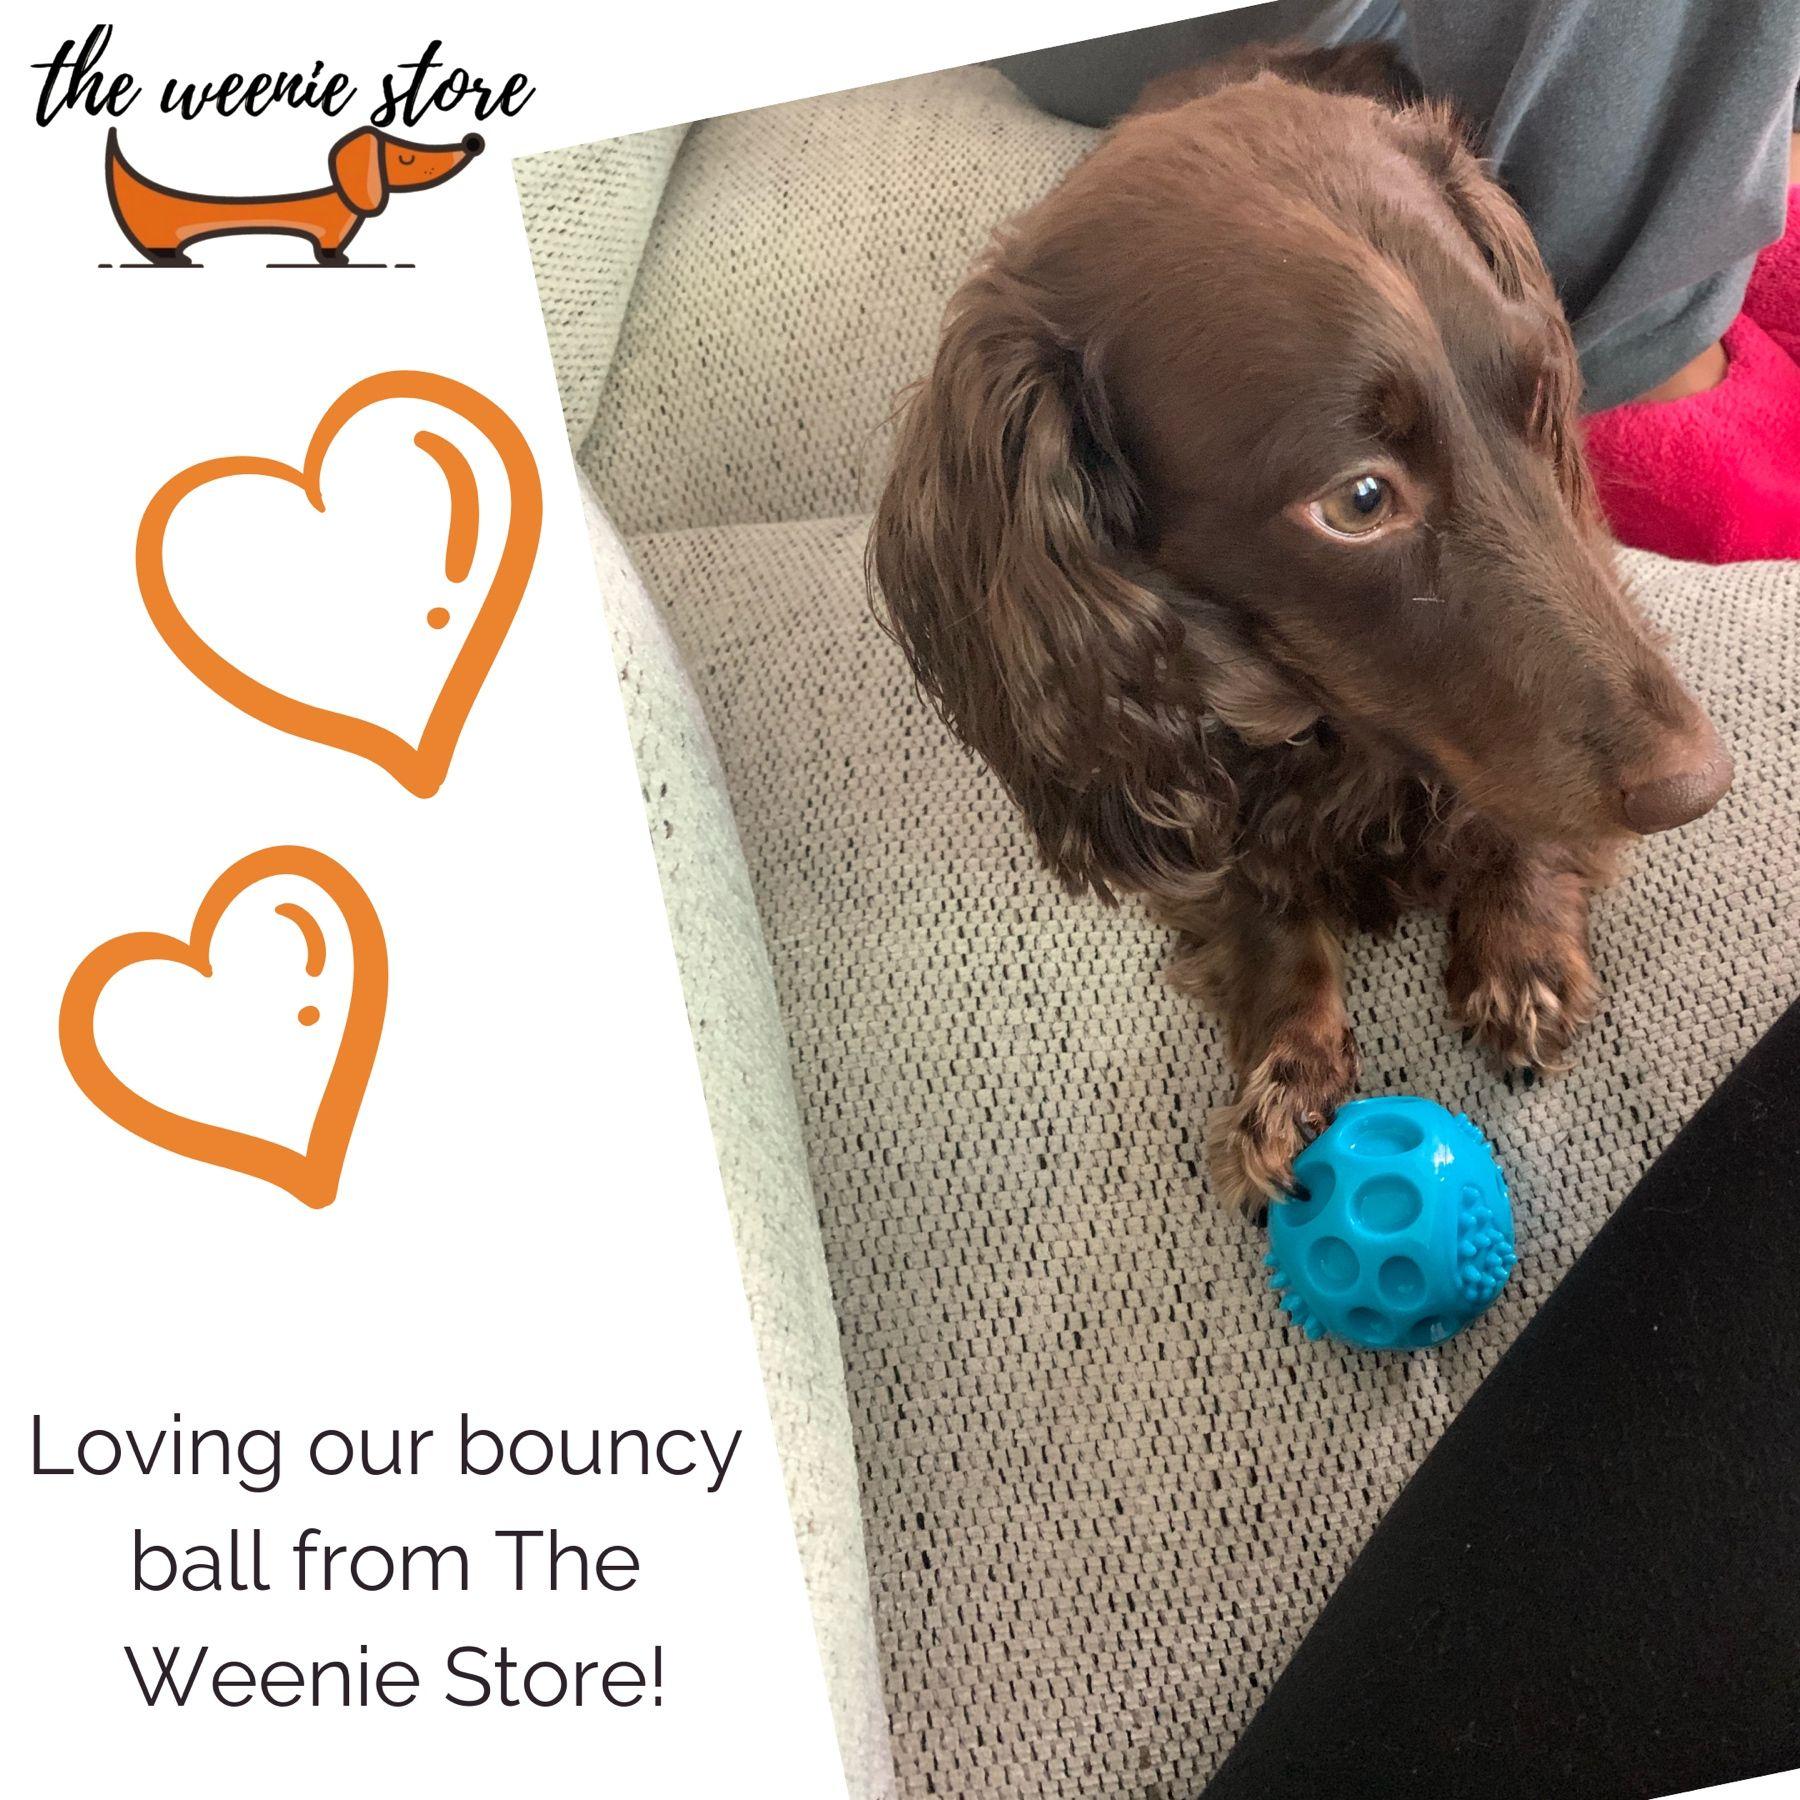 Xoxo The Weenie Store